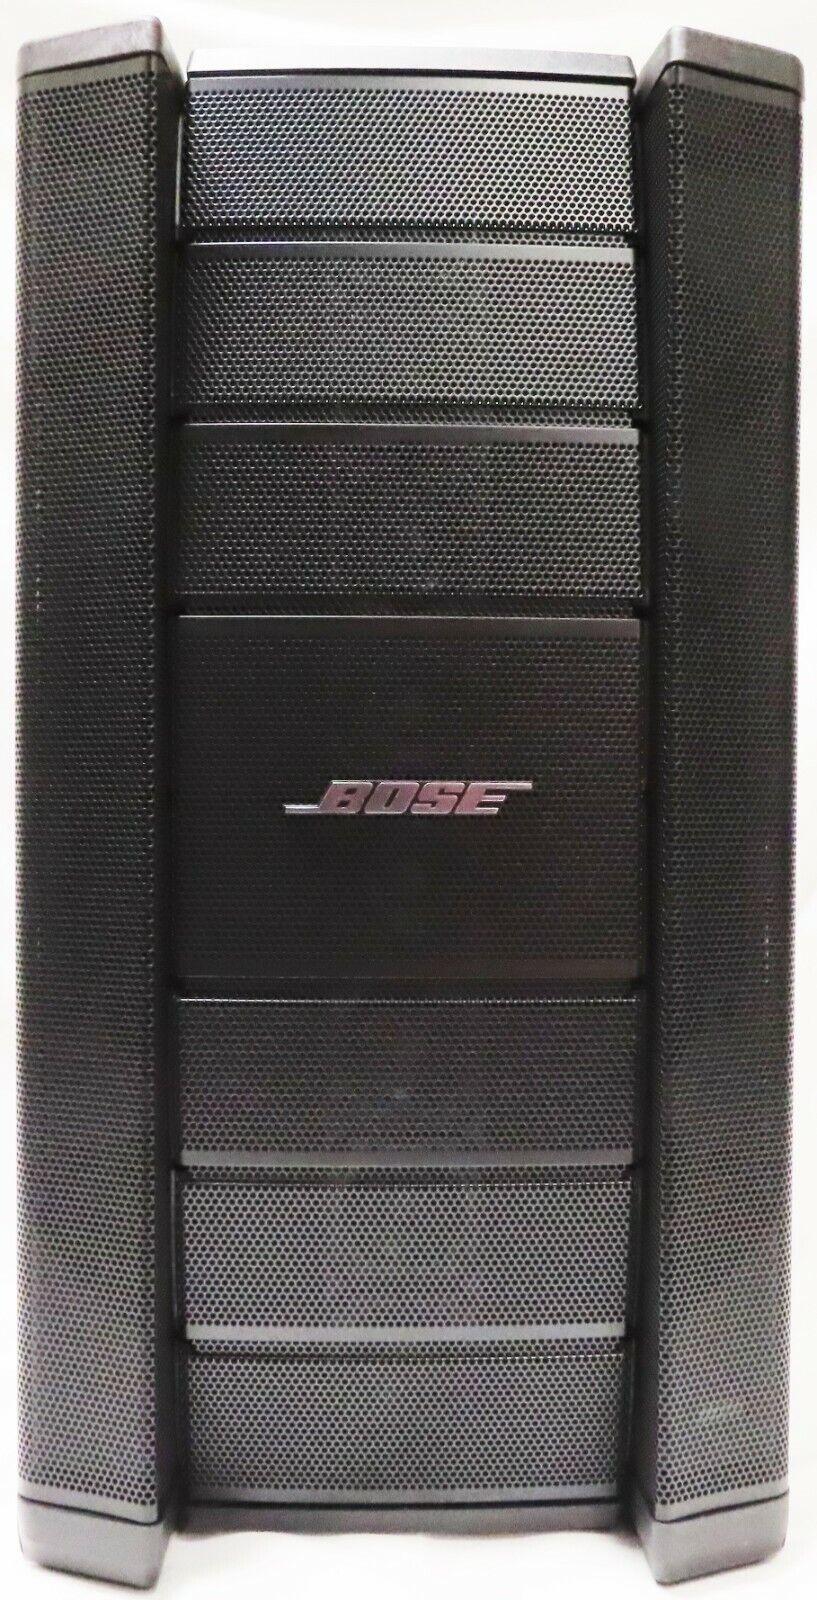 Bose F1 Model 812 Flexible Array Loudspeaker, Black